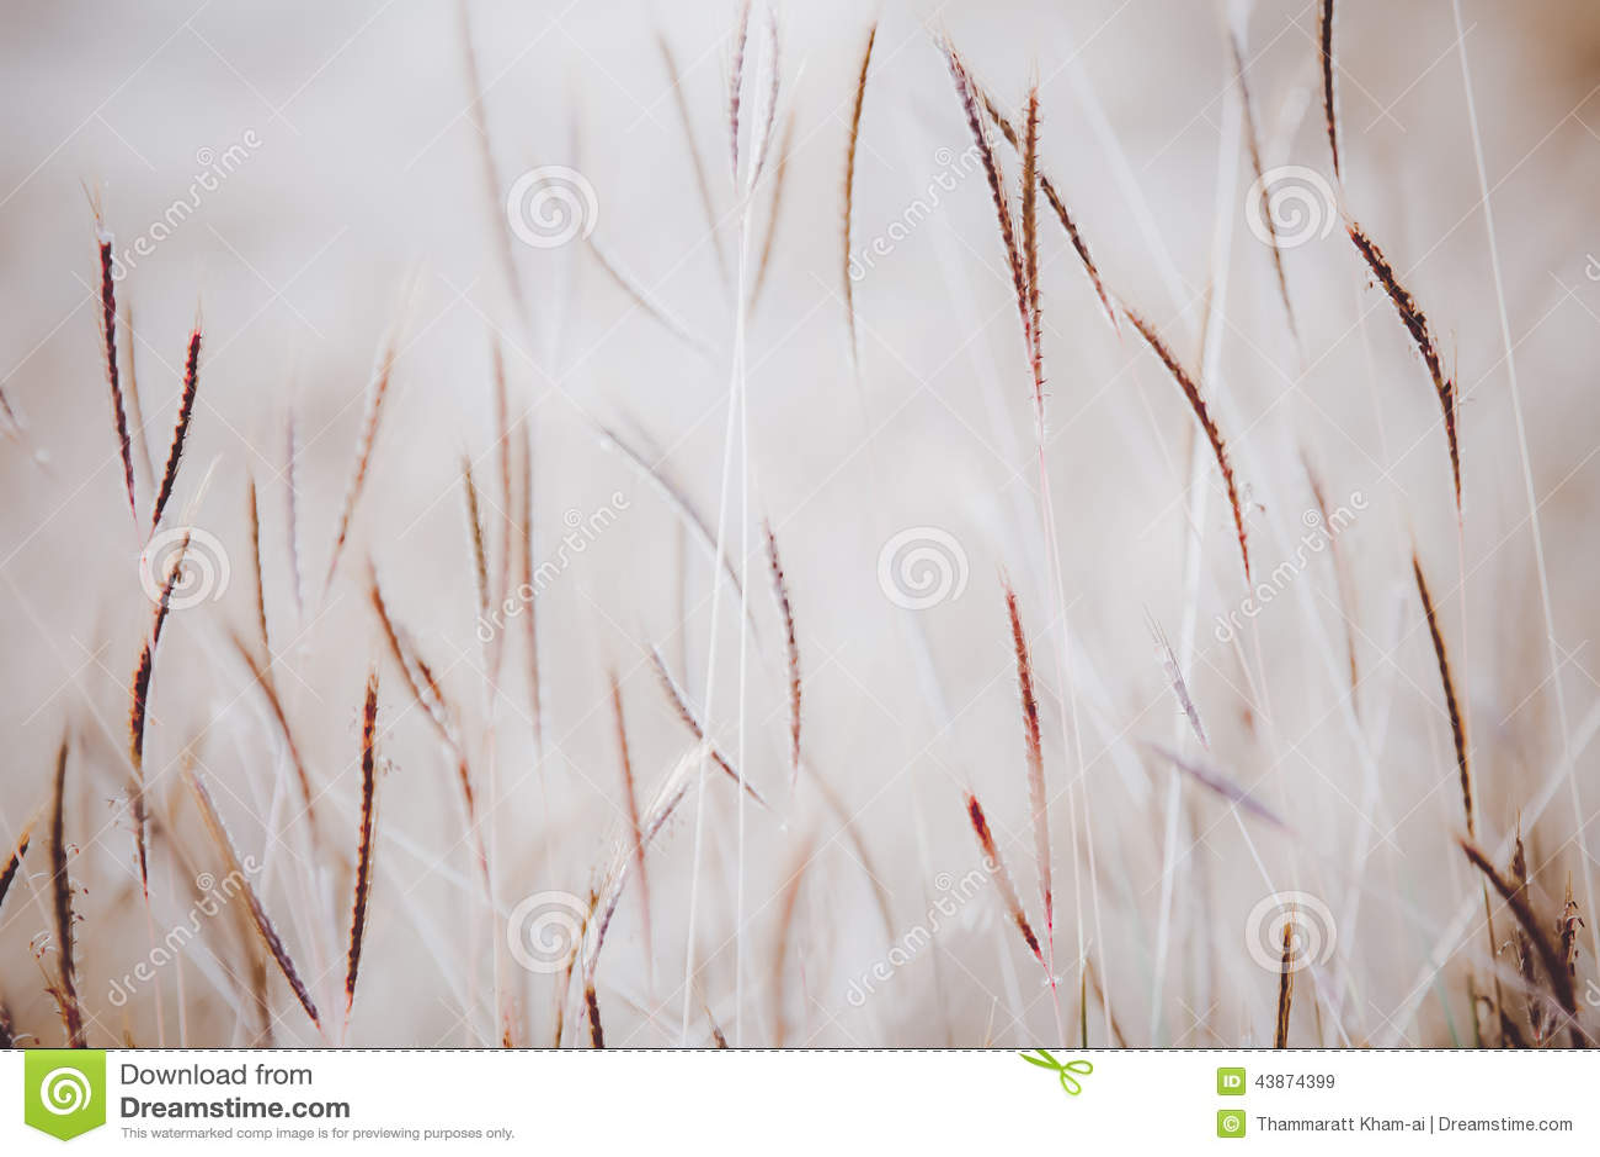 abstract grass wallpaper - photo #30